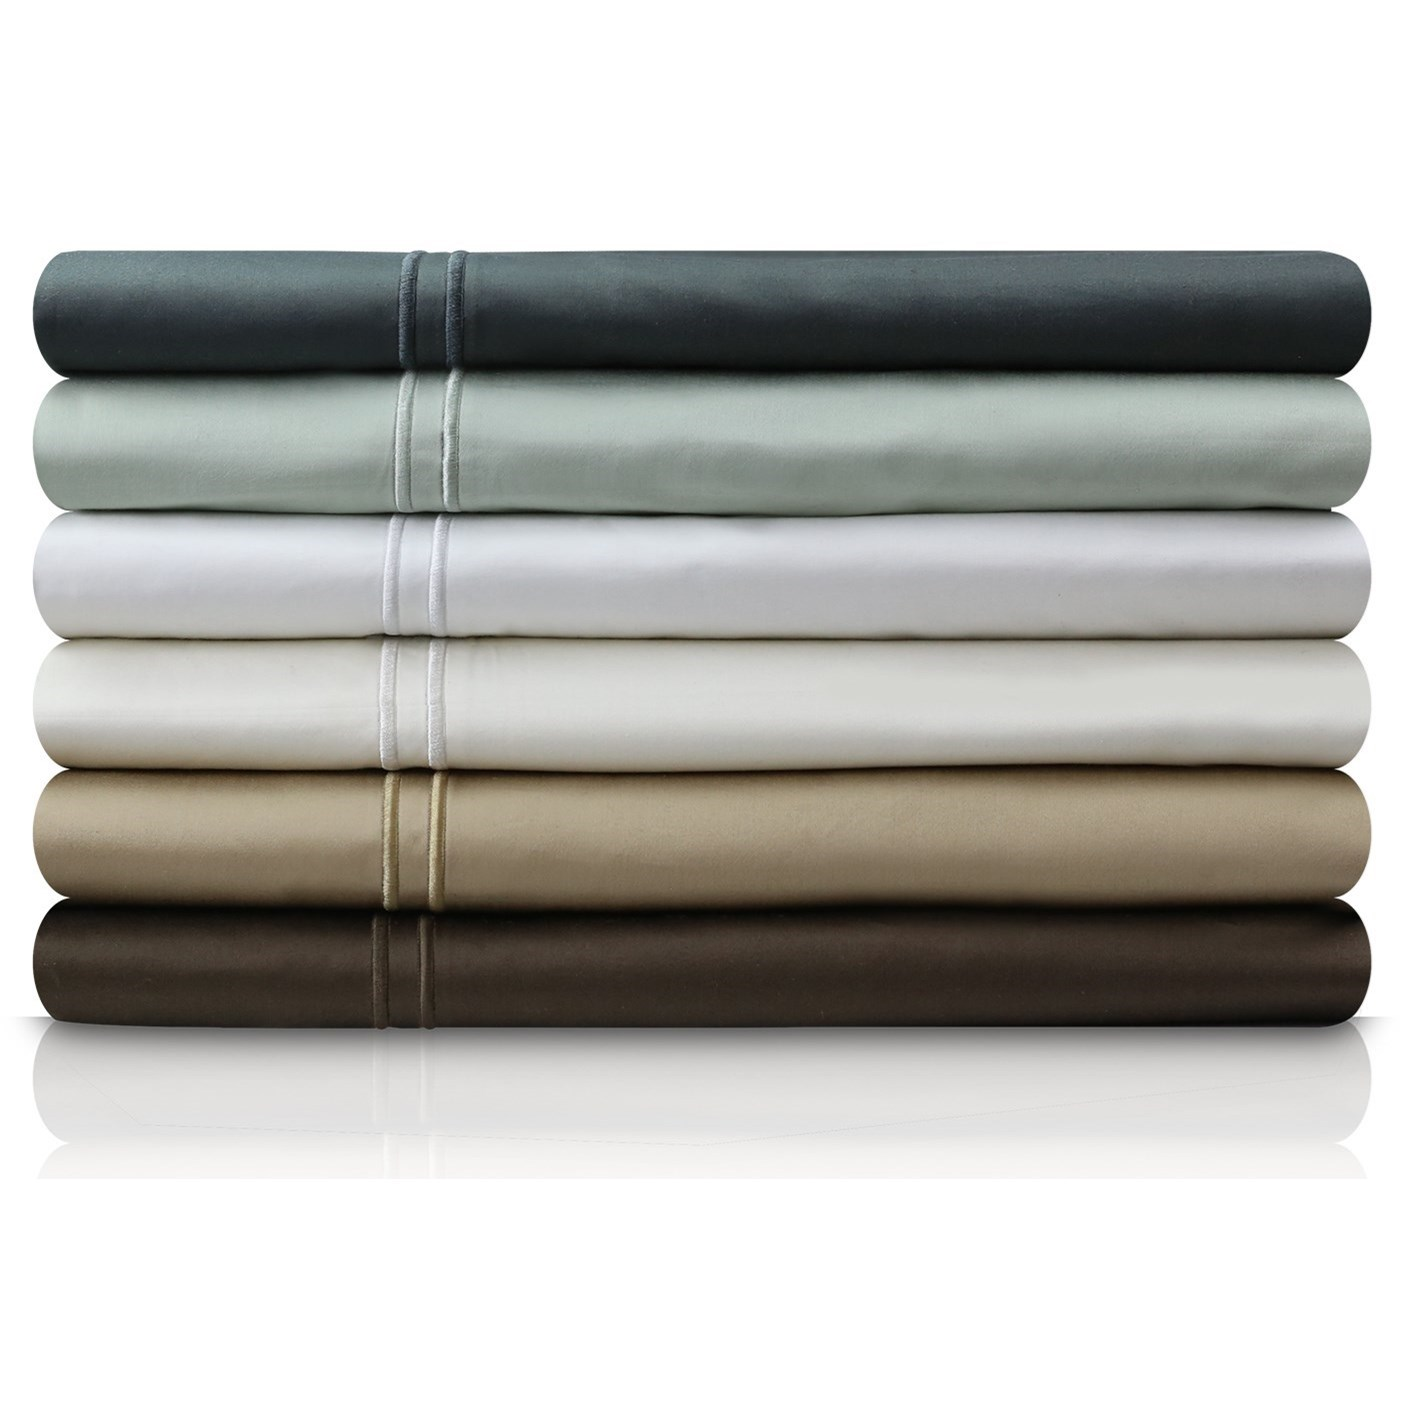 Malouf Egyptian Cotton Full XL 600 TC Egyptian Cotton Sheet Set - Item Number: MA06FXSISS